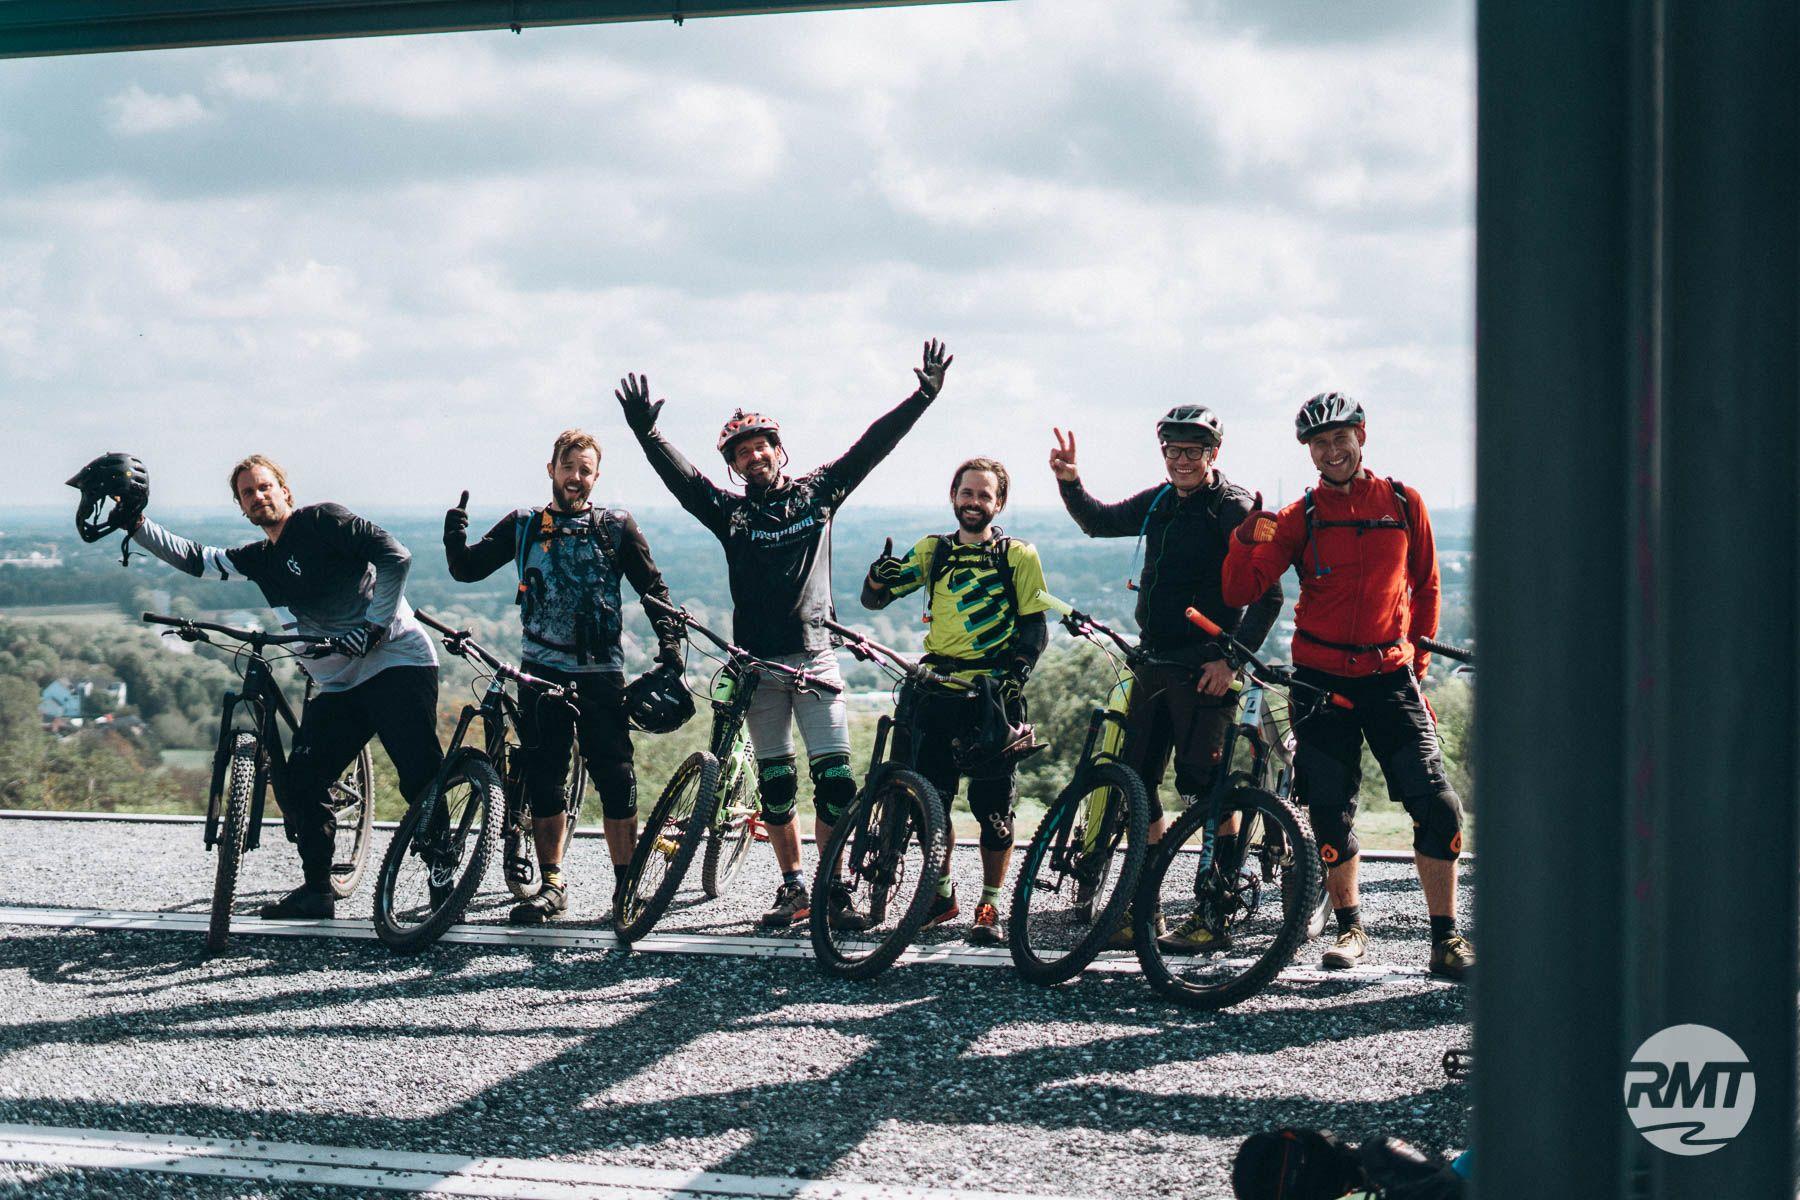 MTB eBike Fahrtechnik Kurse Moers Sprung Kurs Training Rock my Trail Halde Norddeutschland - Bikeschule -1